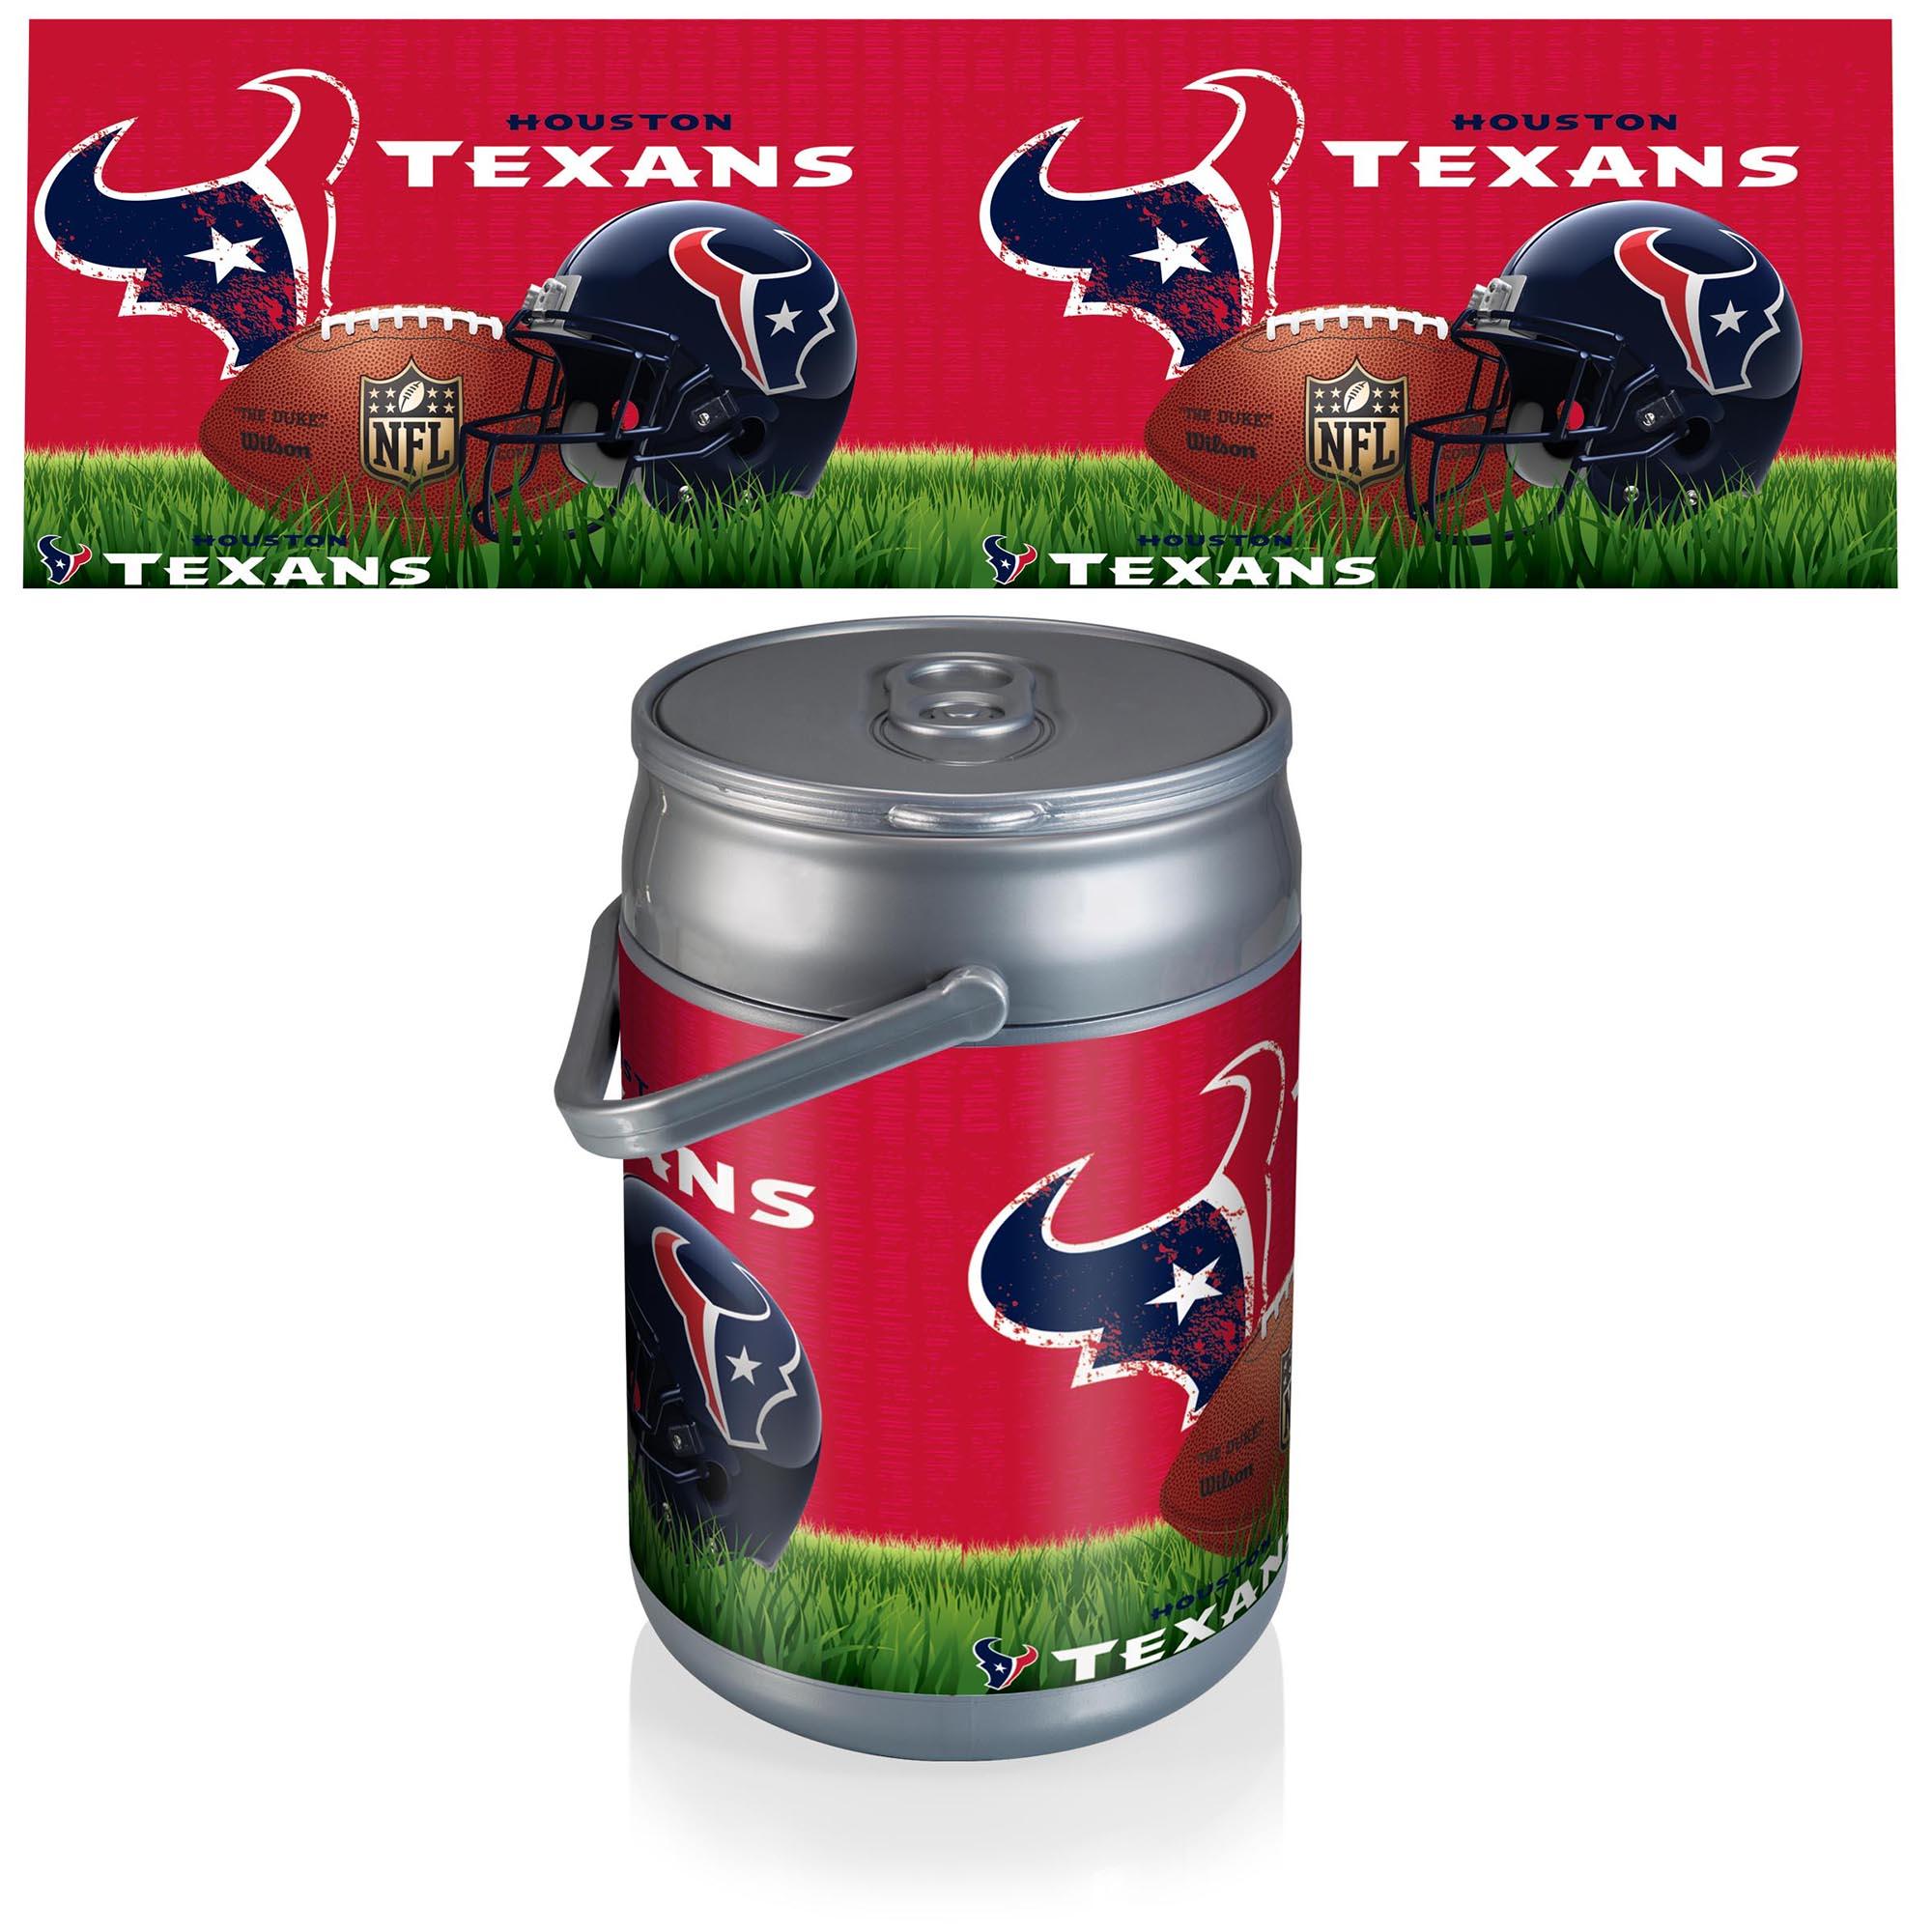 Houston Texans Football Can Cooler